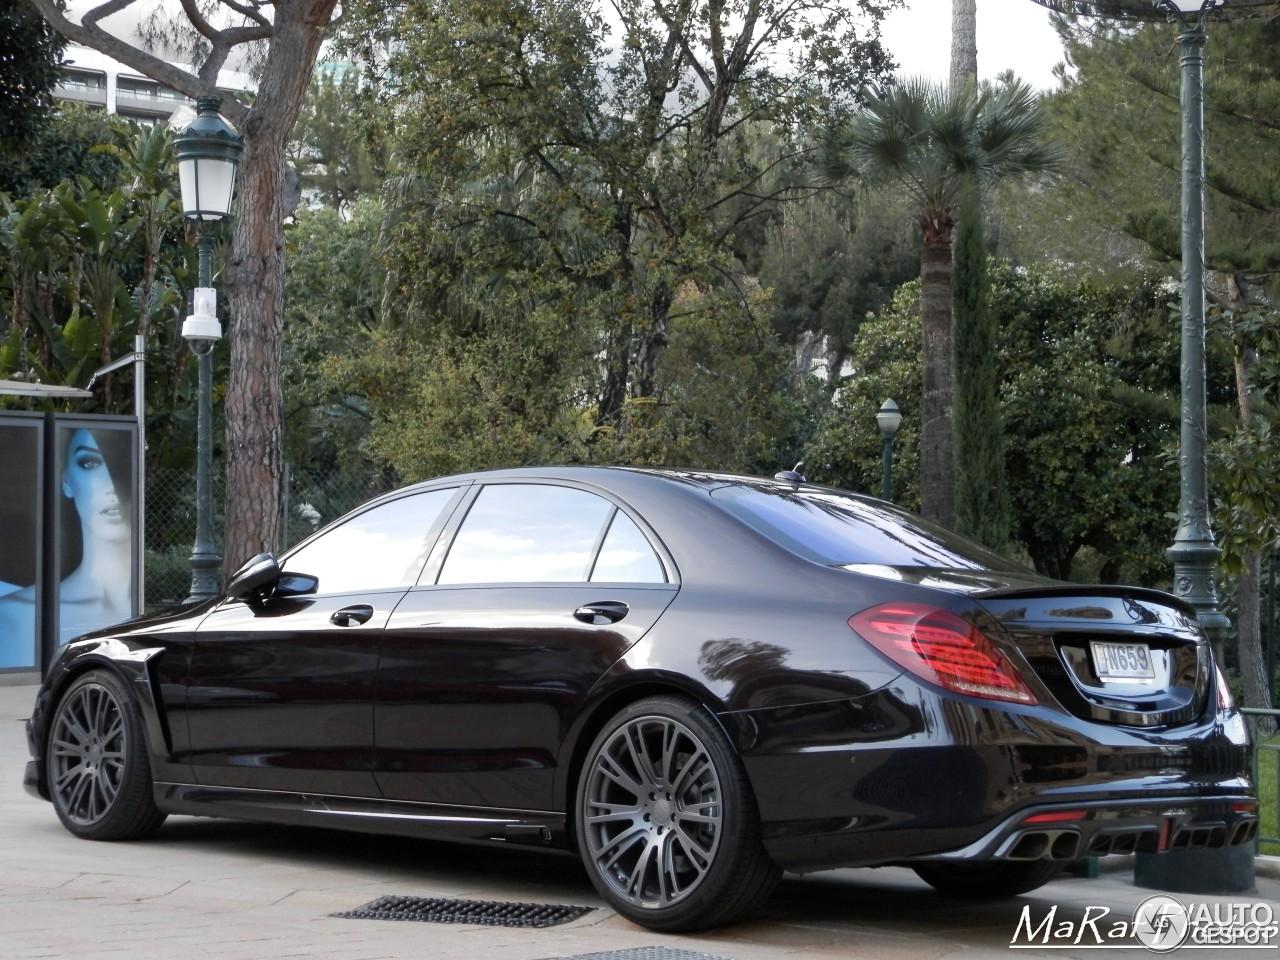 Mercedes benz brabus s b63 650 v222 27 april 2016 for Mercedes benz brabus price